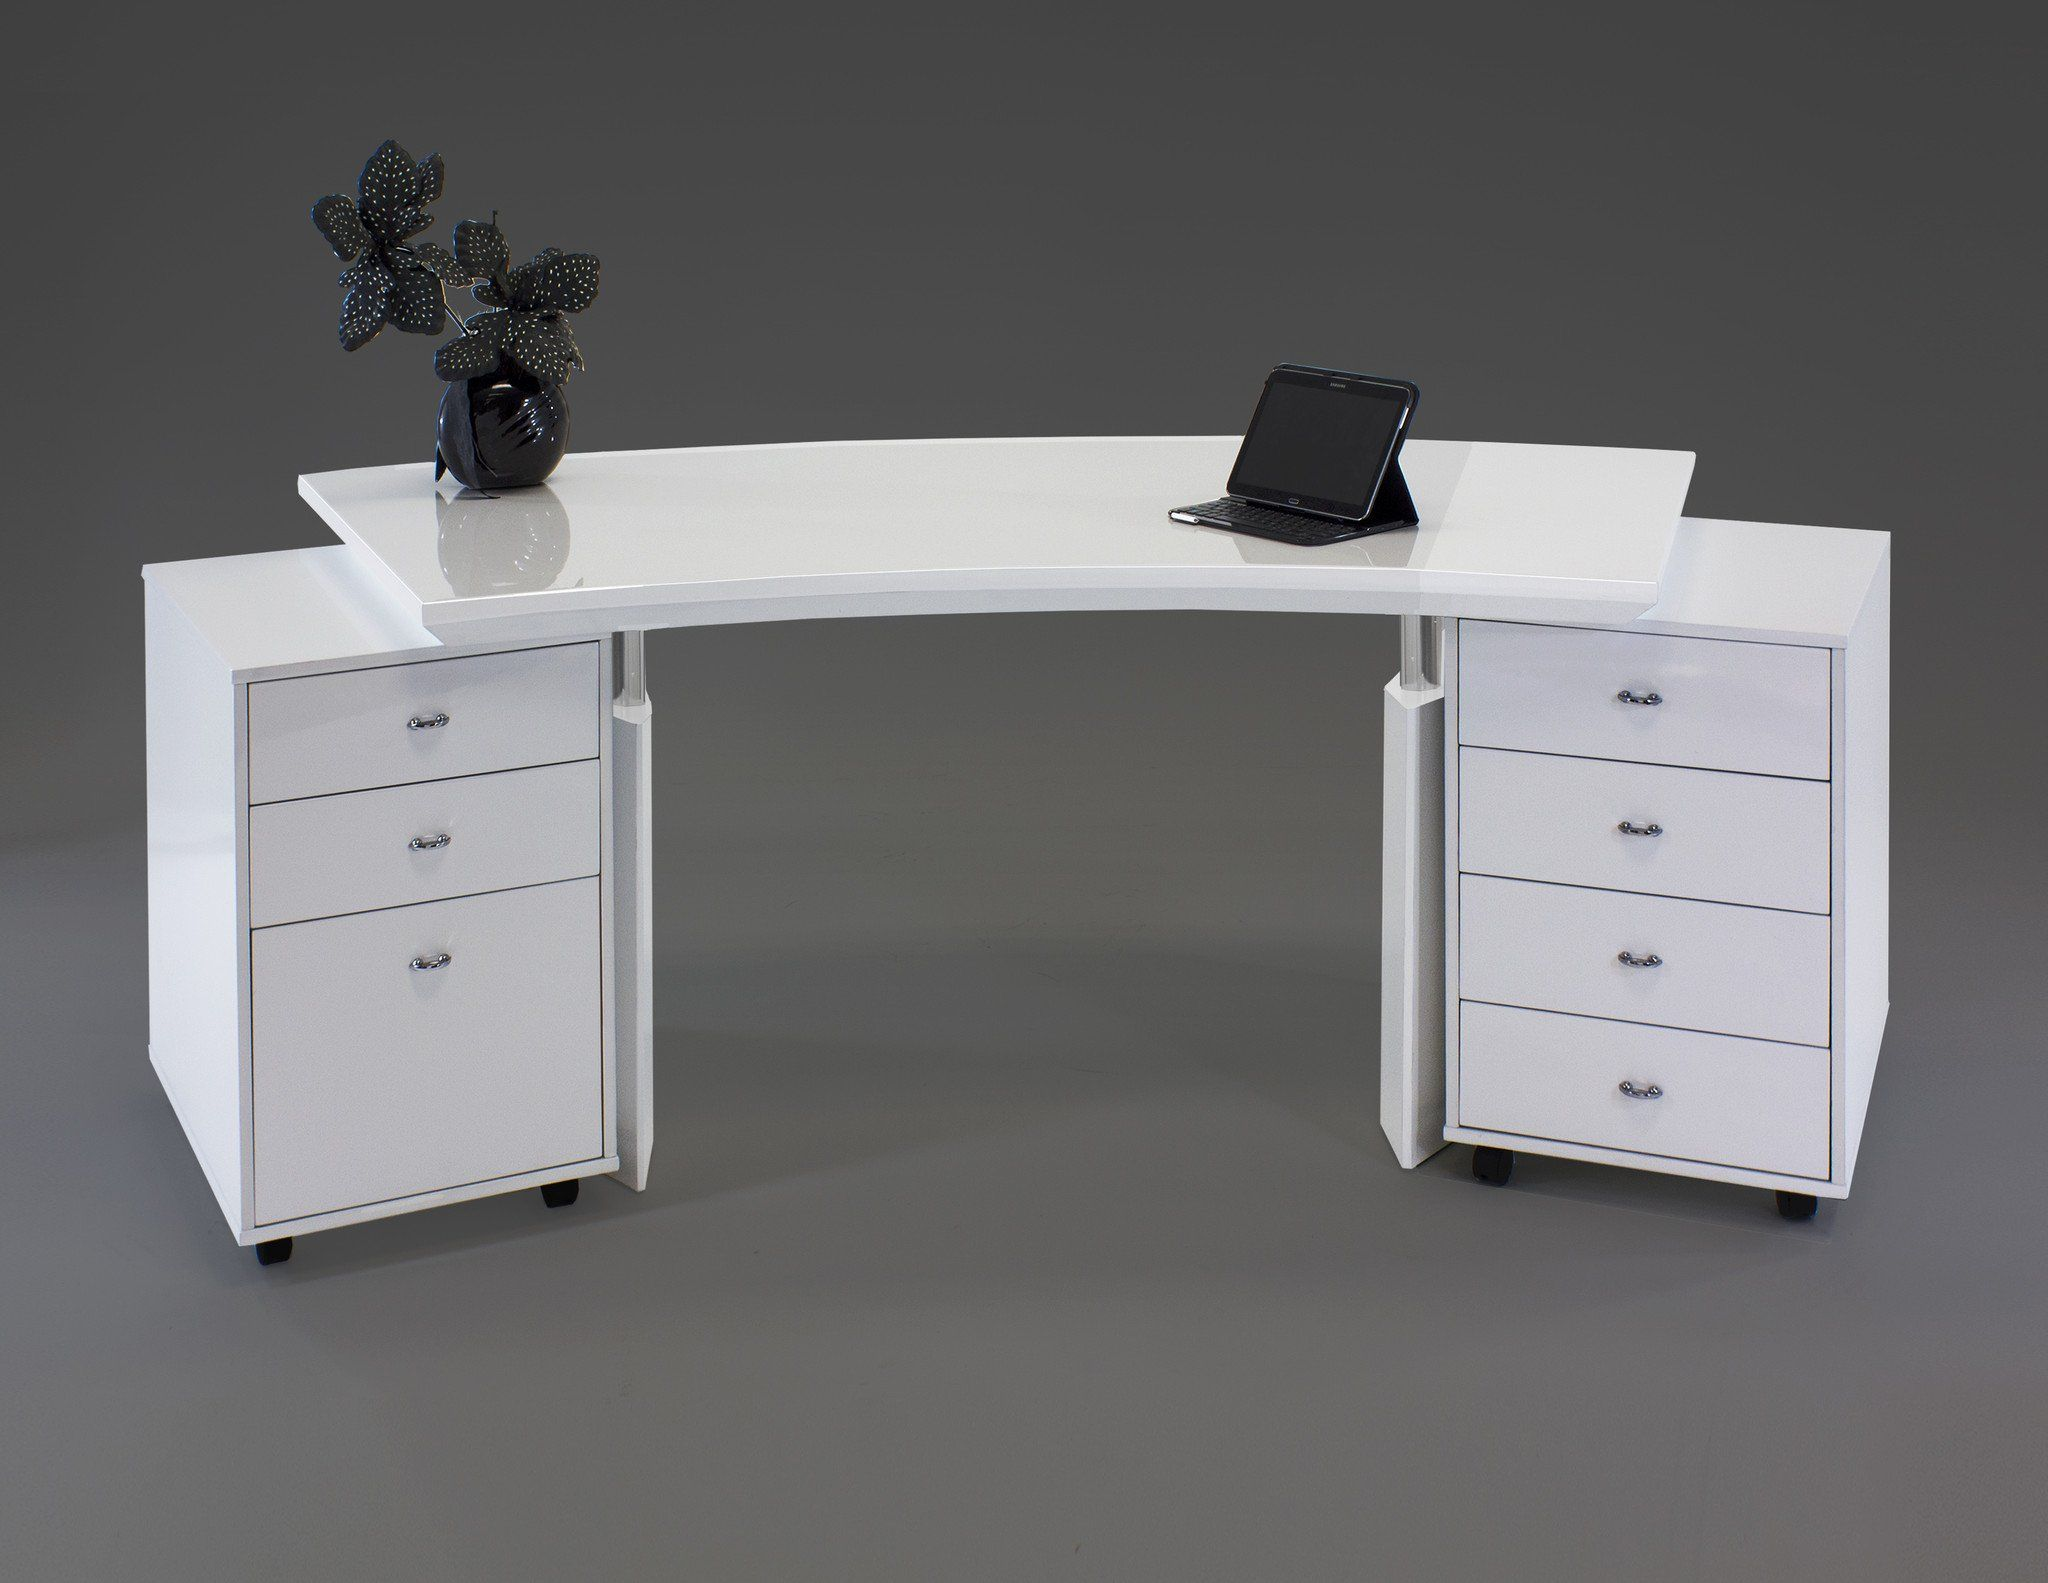 Modern Curved White Lacquer Executive Desk With Two Mobile Files Curved Desk White Lacquer Desk Desk